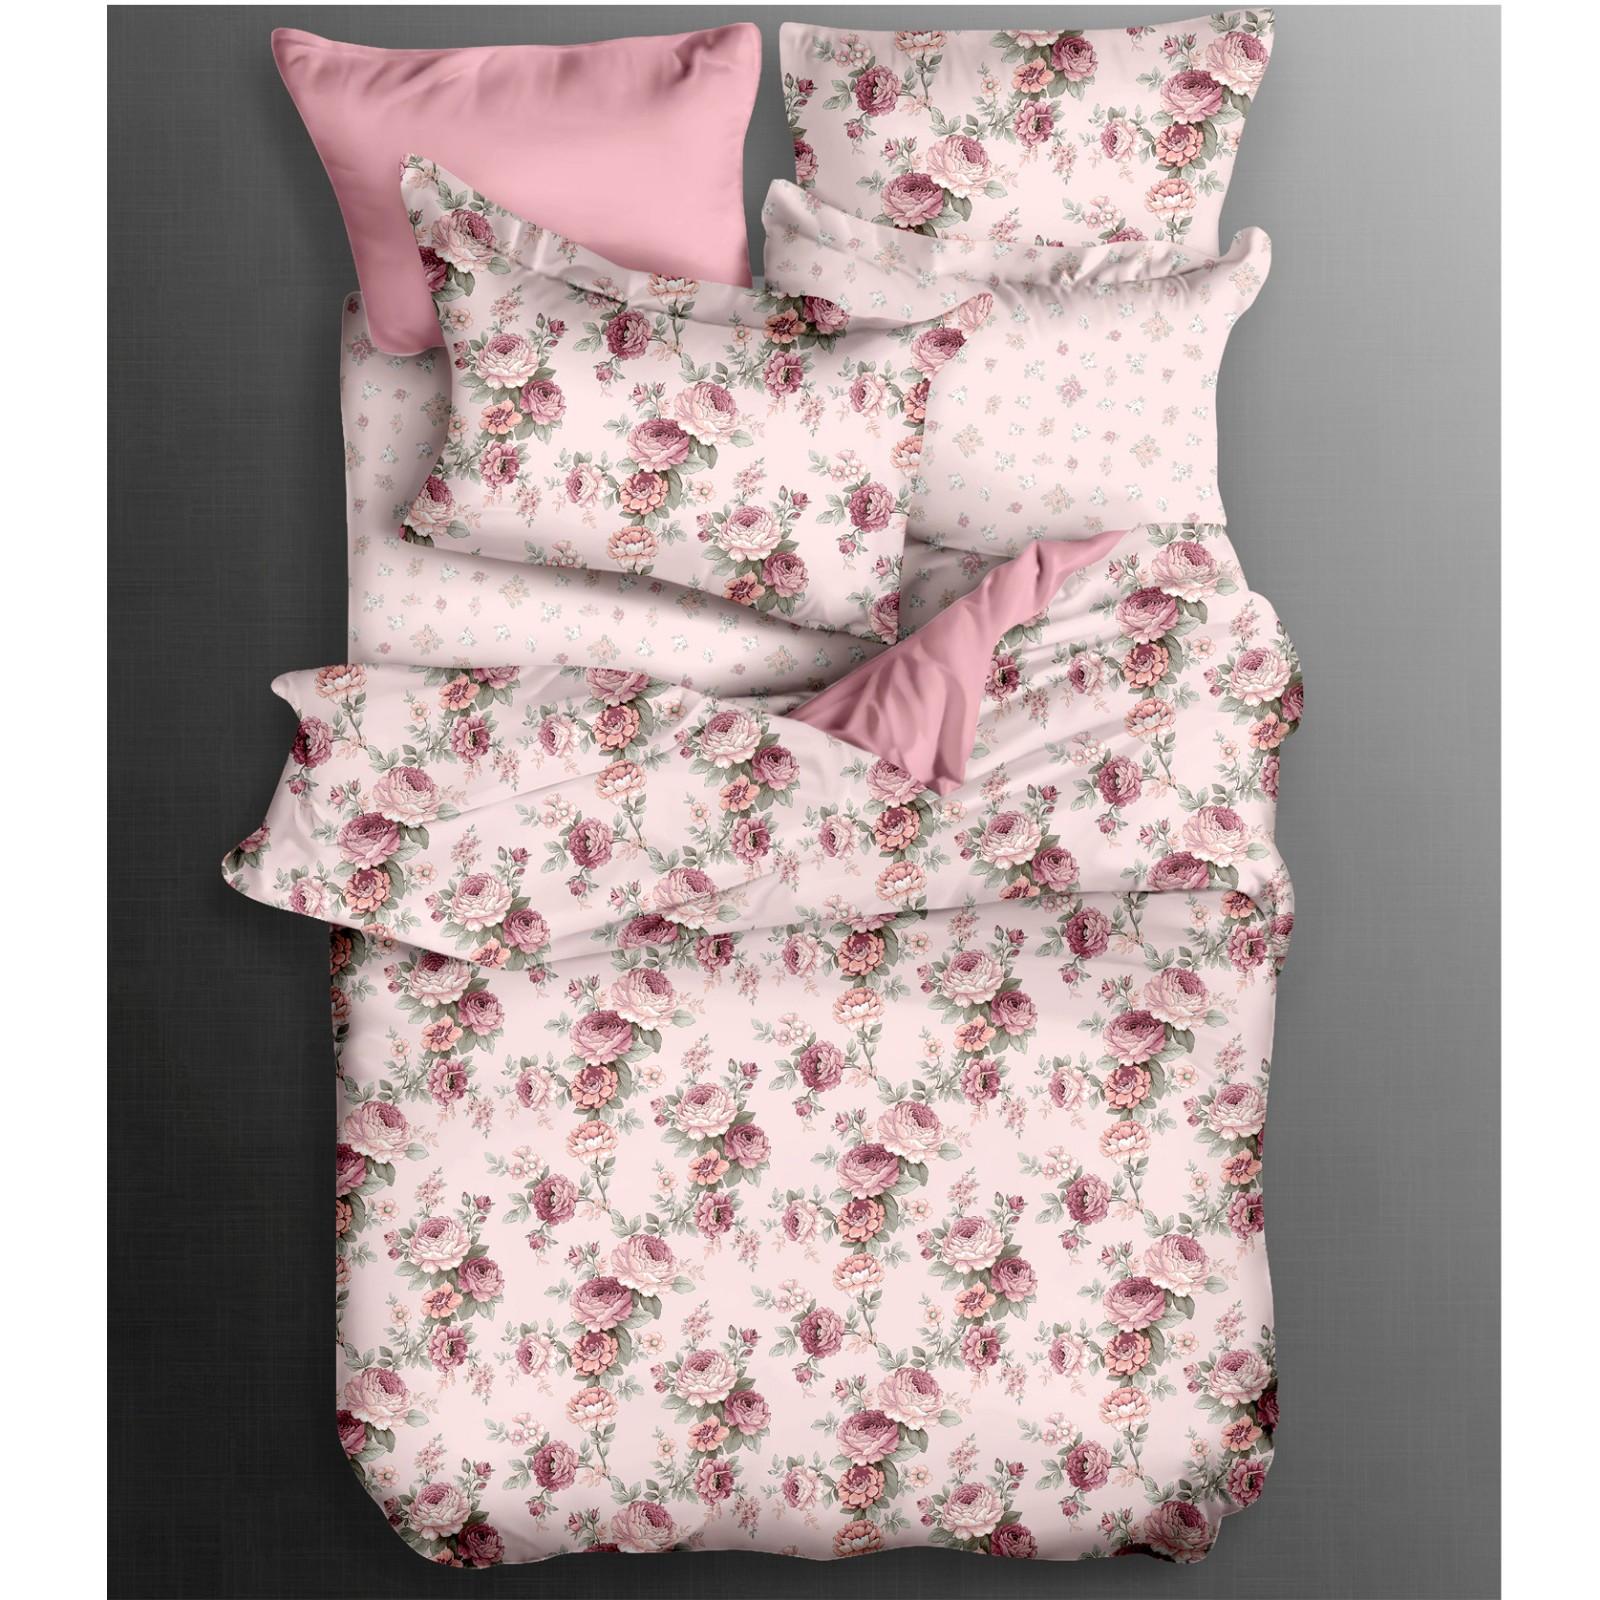 Daphne joint cotton Cotton Bedding Sets print printing